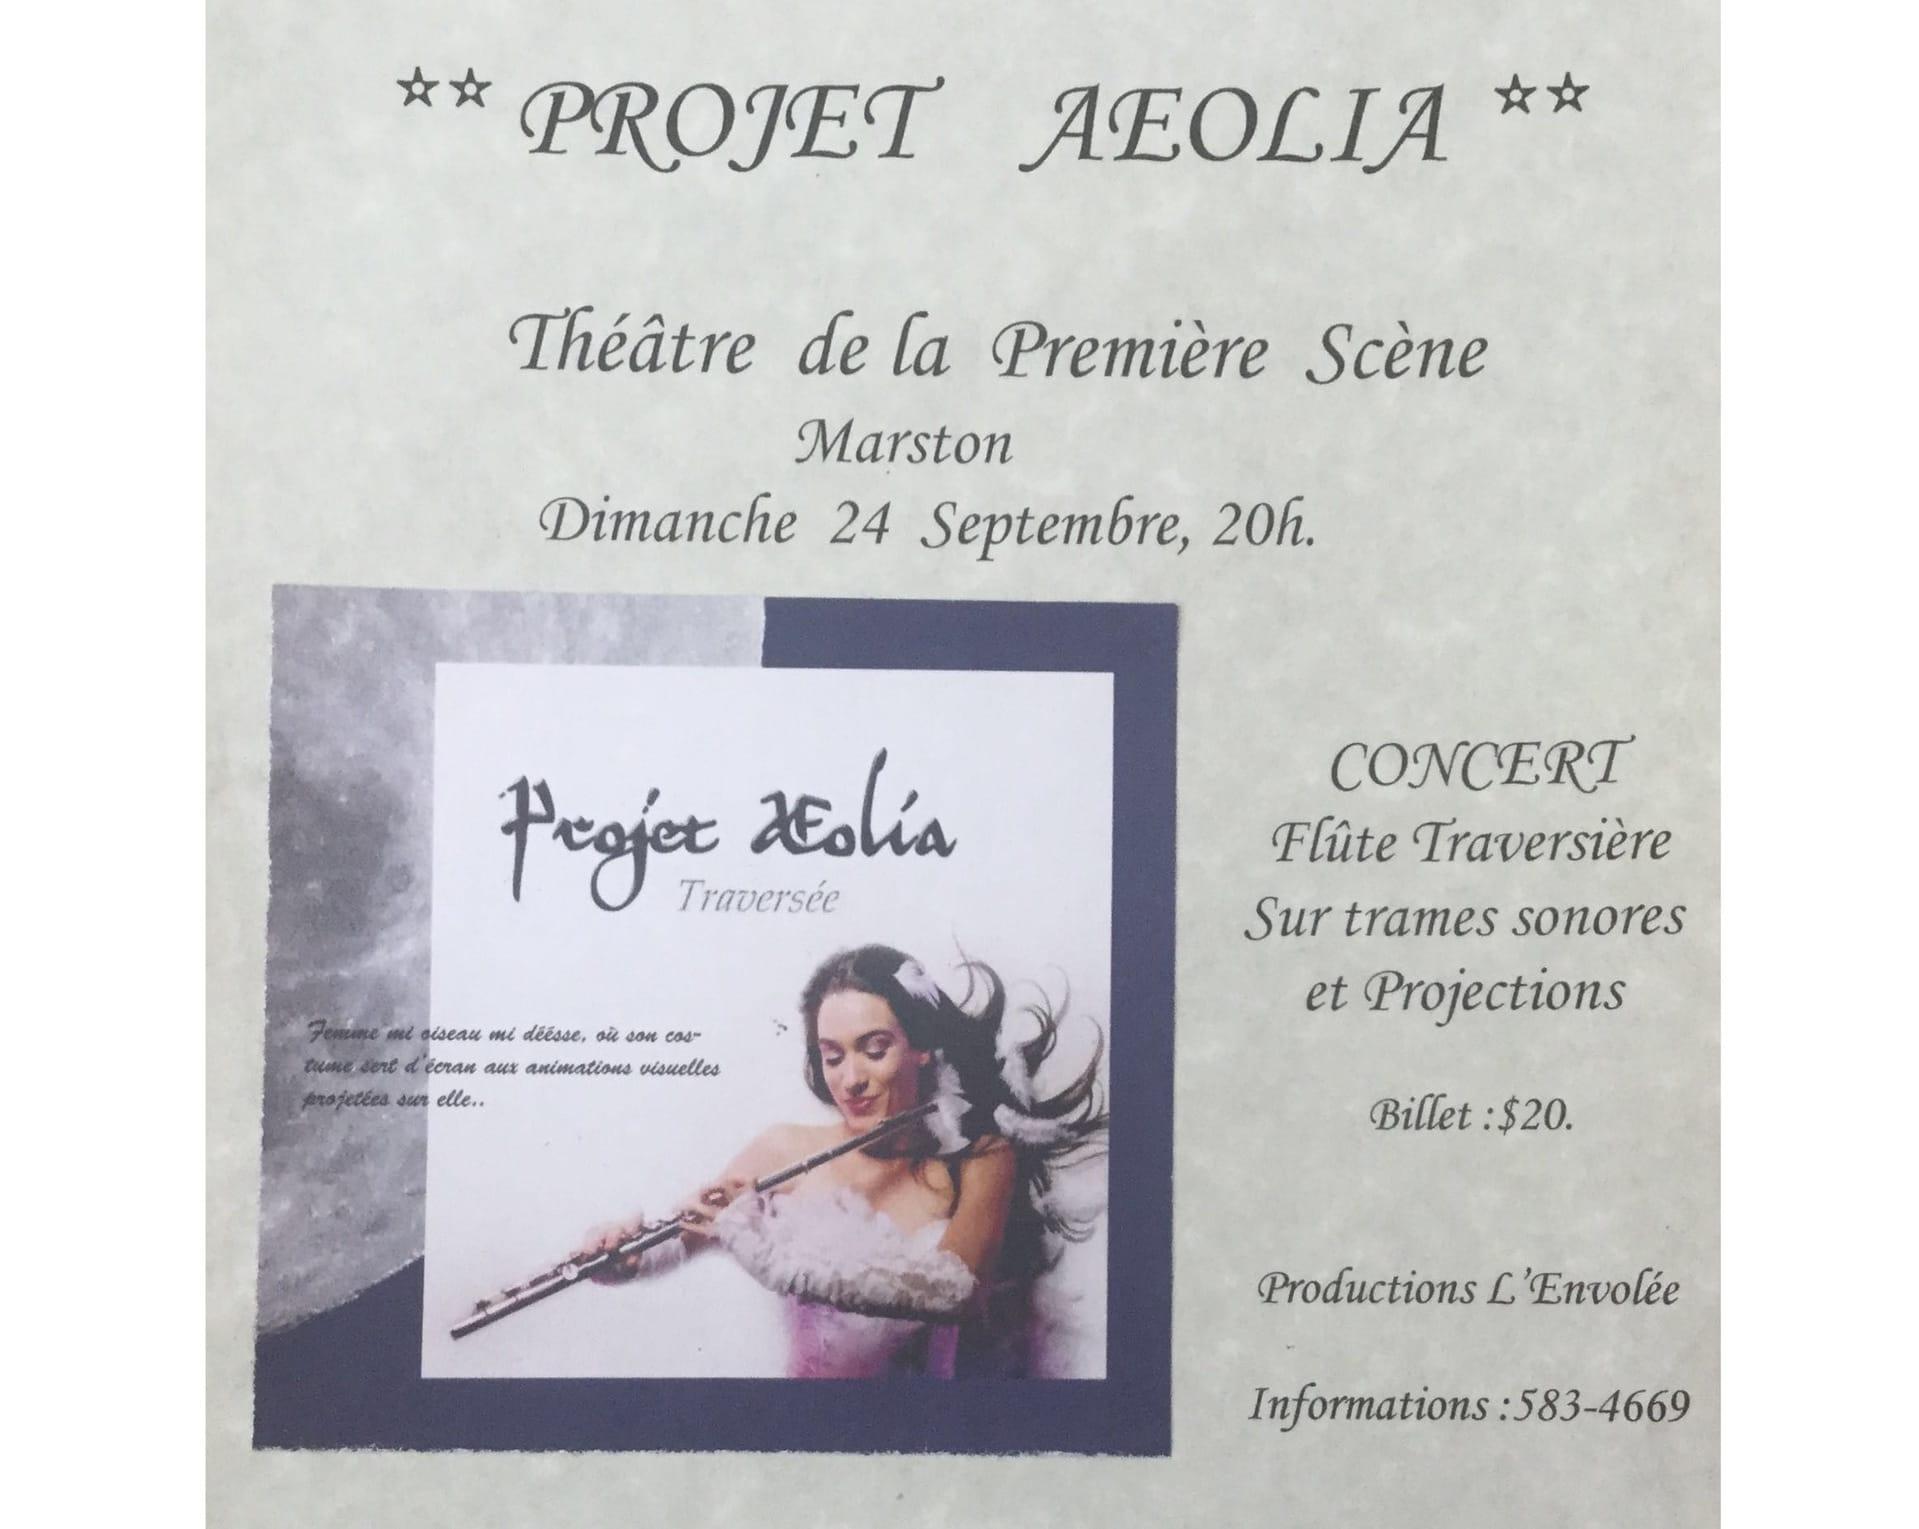 Projet Aeolia